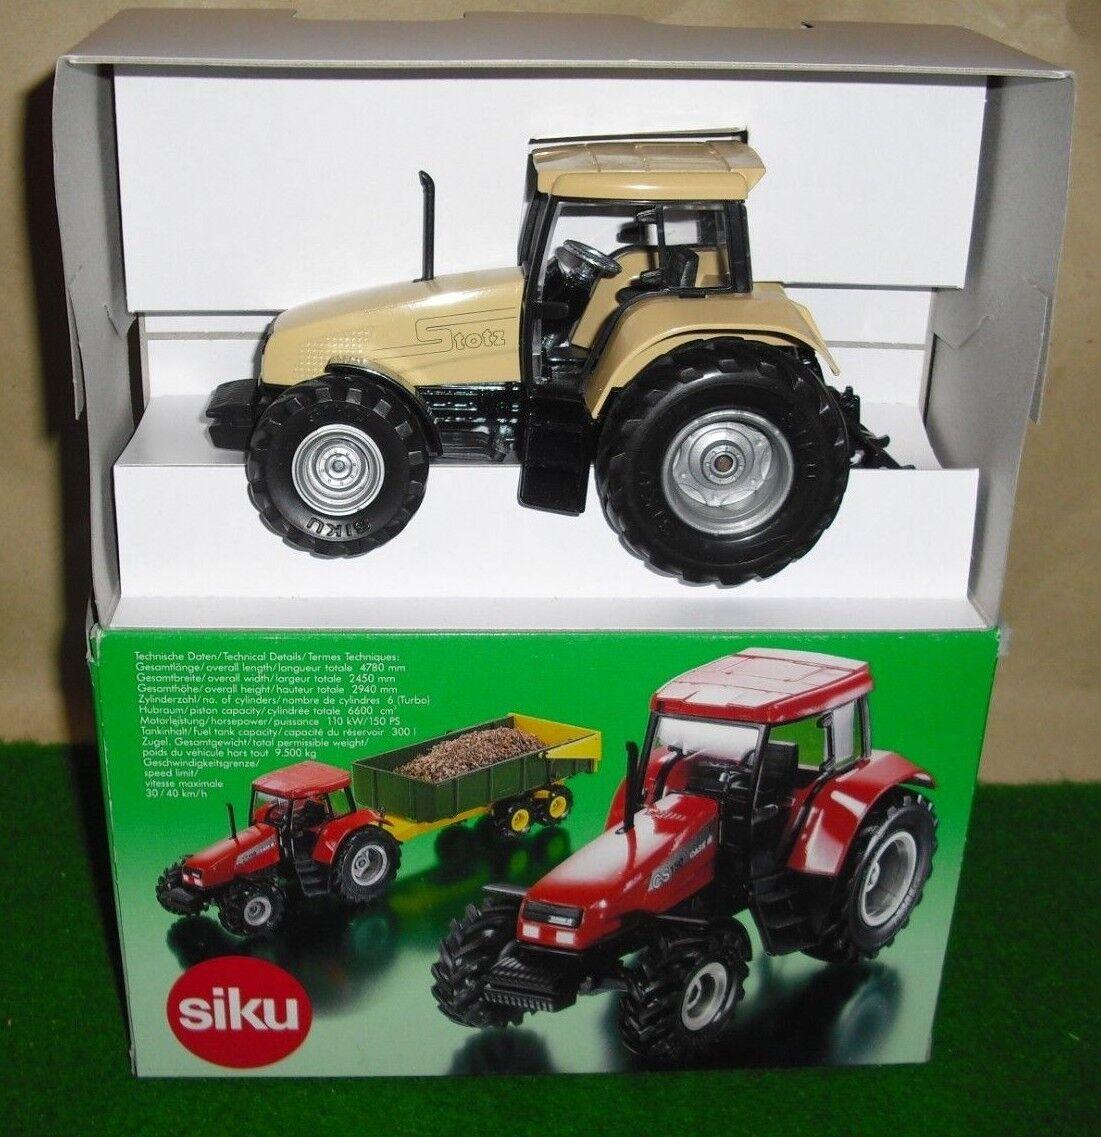 SIKU Spécial Modèle Nº 2963 tracteur CASE CS 150-Société Stotz-Neuf U neuf dans sa boîte - 1 32